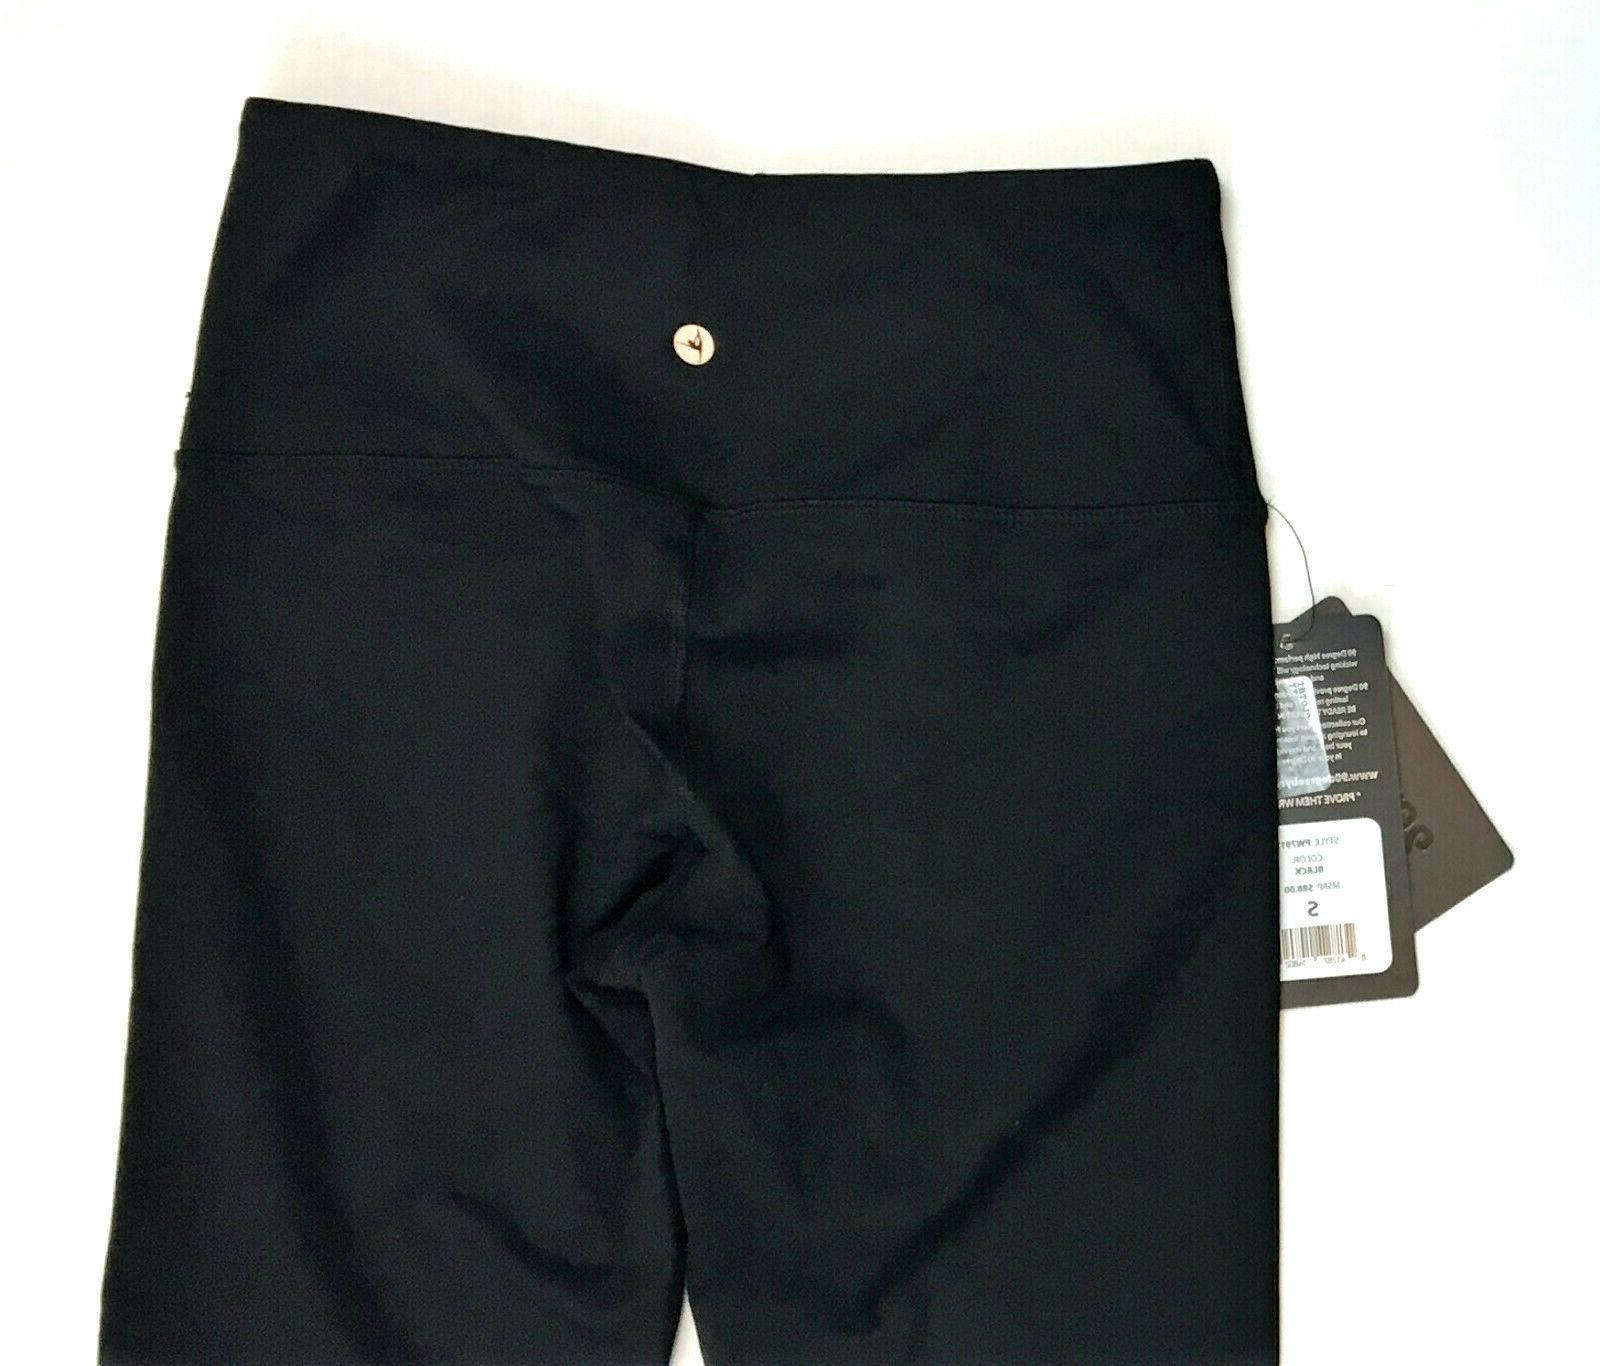 90 Degree By Reflex High Waist Flex Leggings, Black, MSRP $29.99